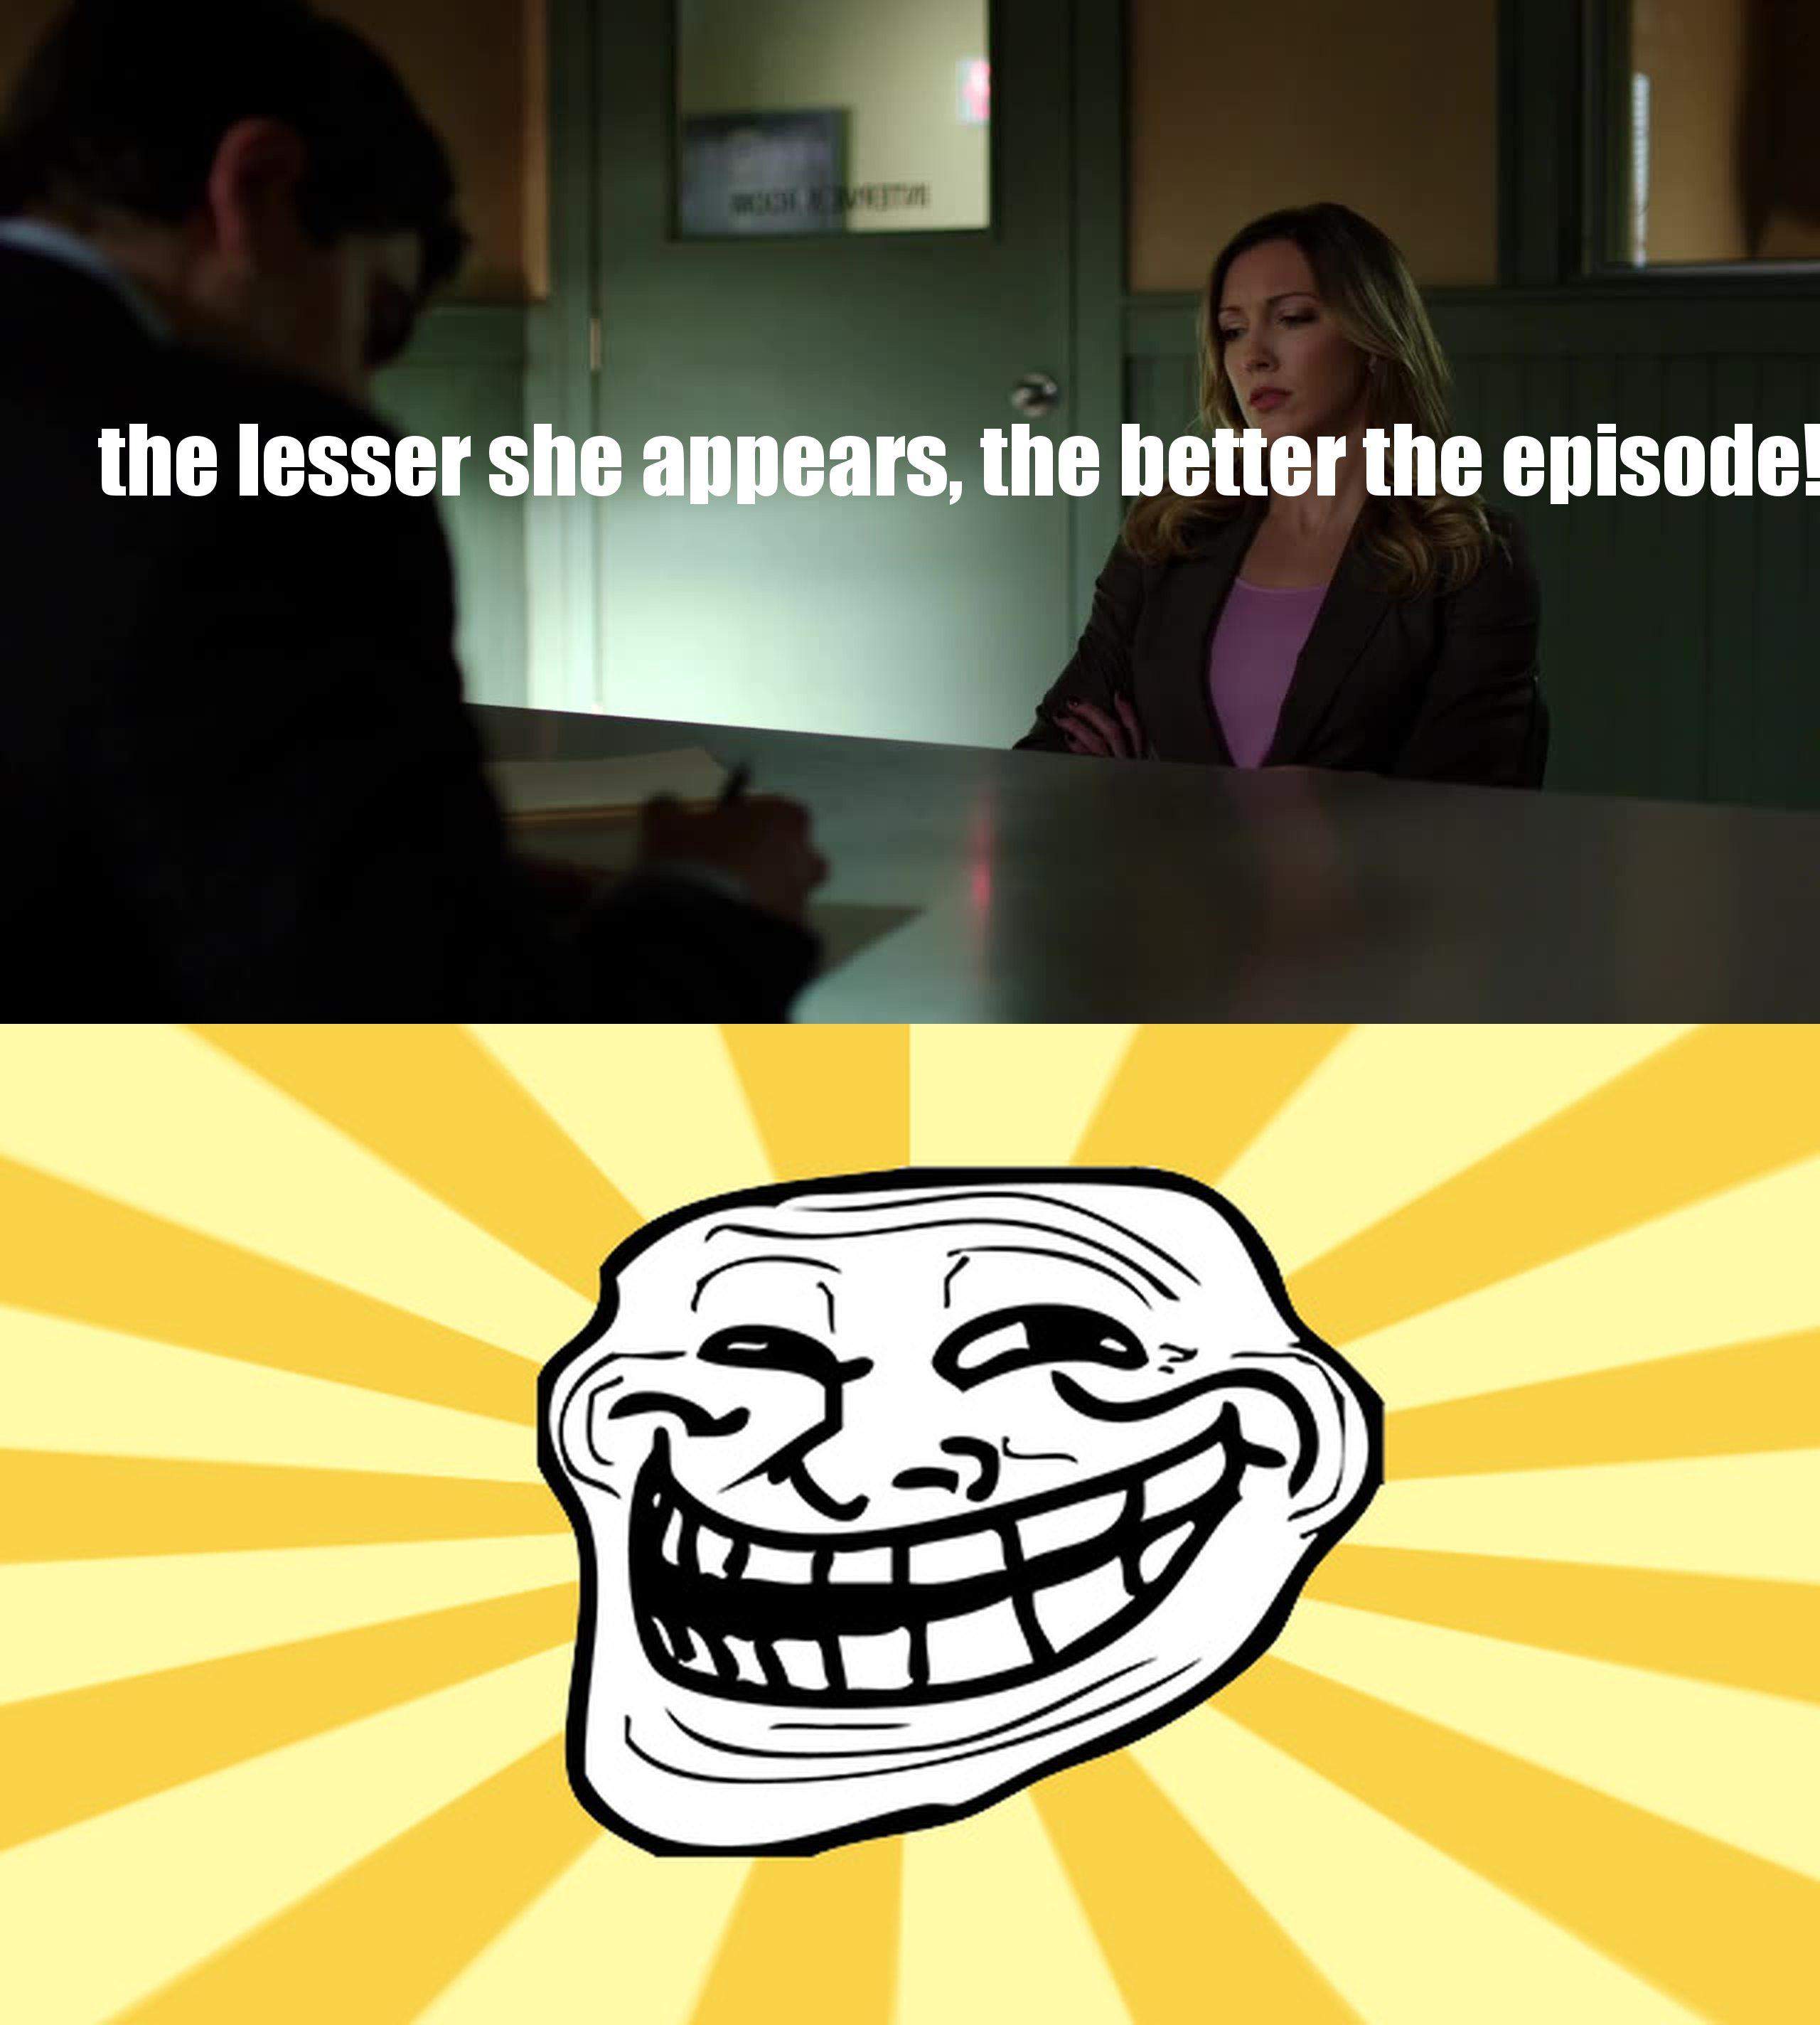 nice episode!